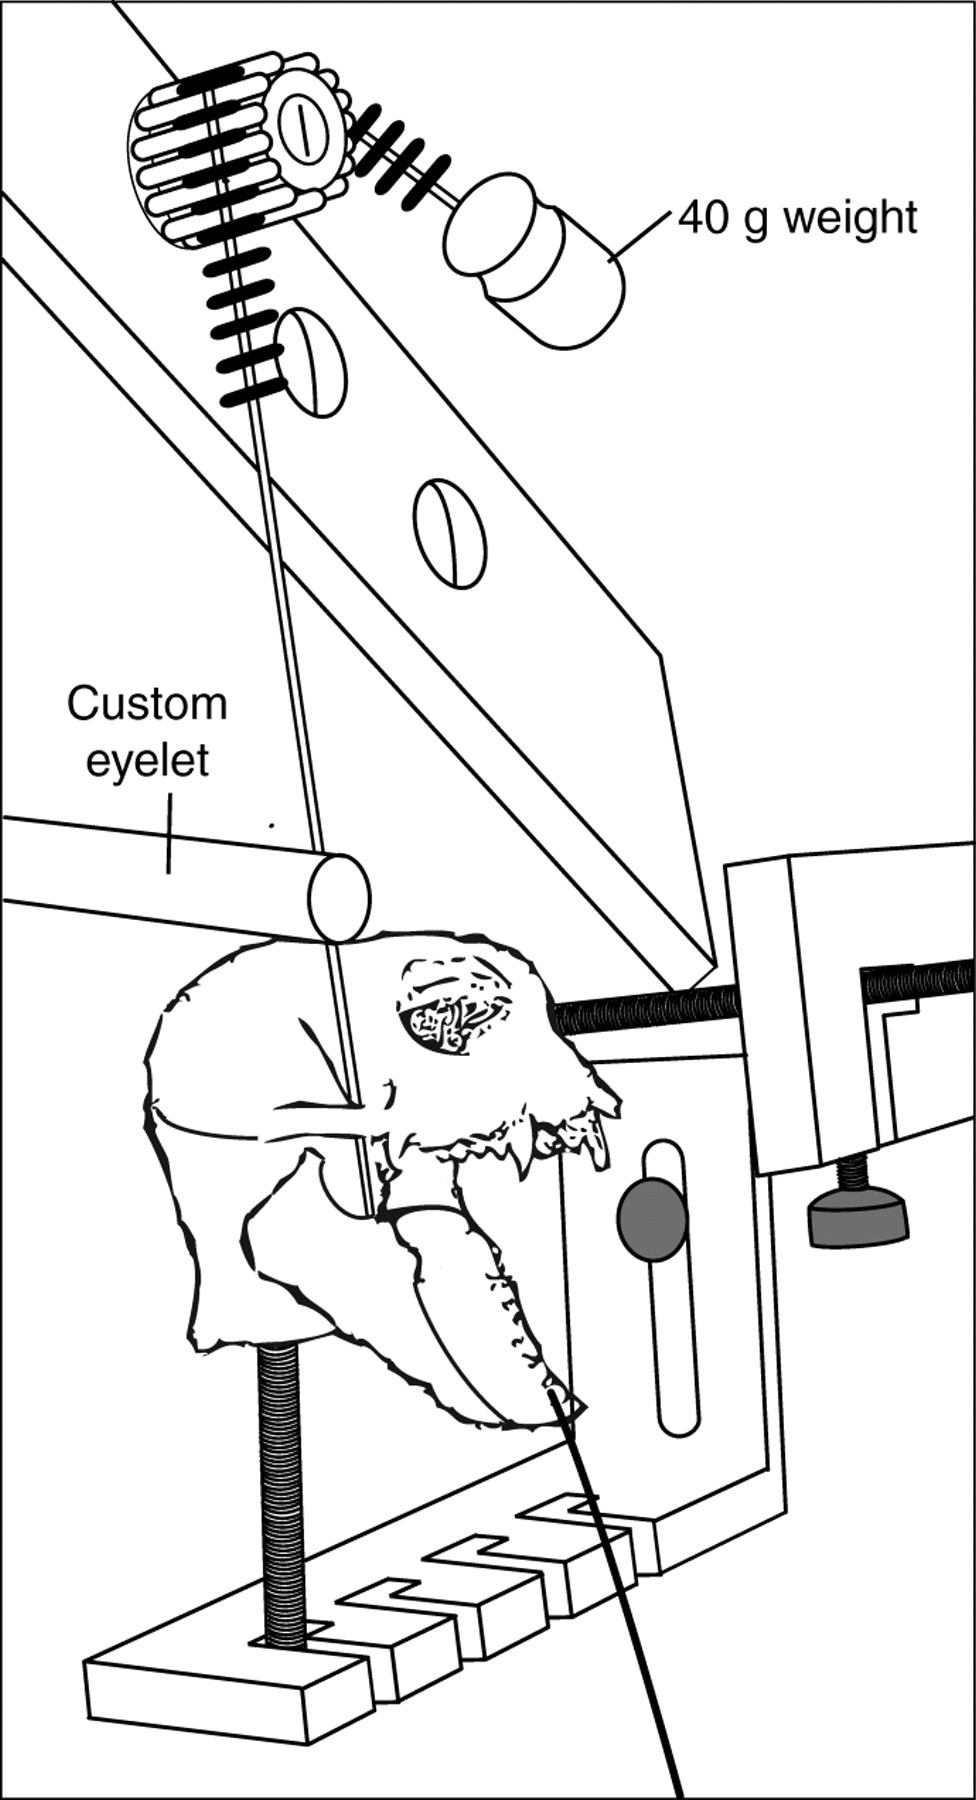 976x1800 The Morphology Of The Masticatory Apparatus Facilitates Muscle